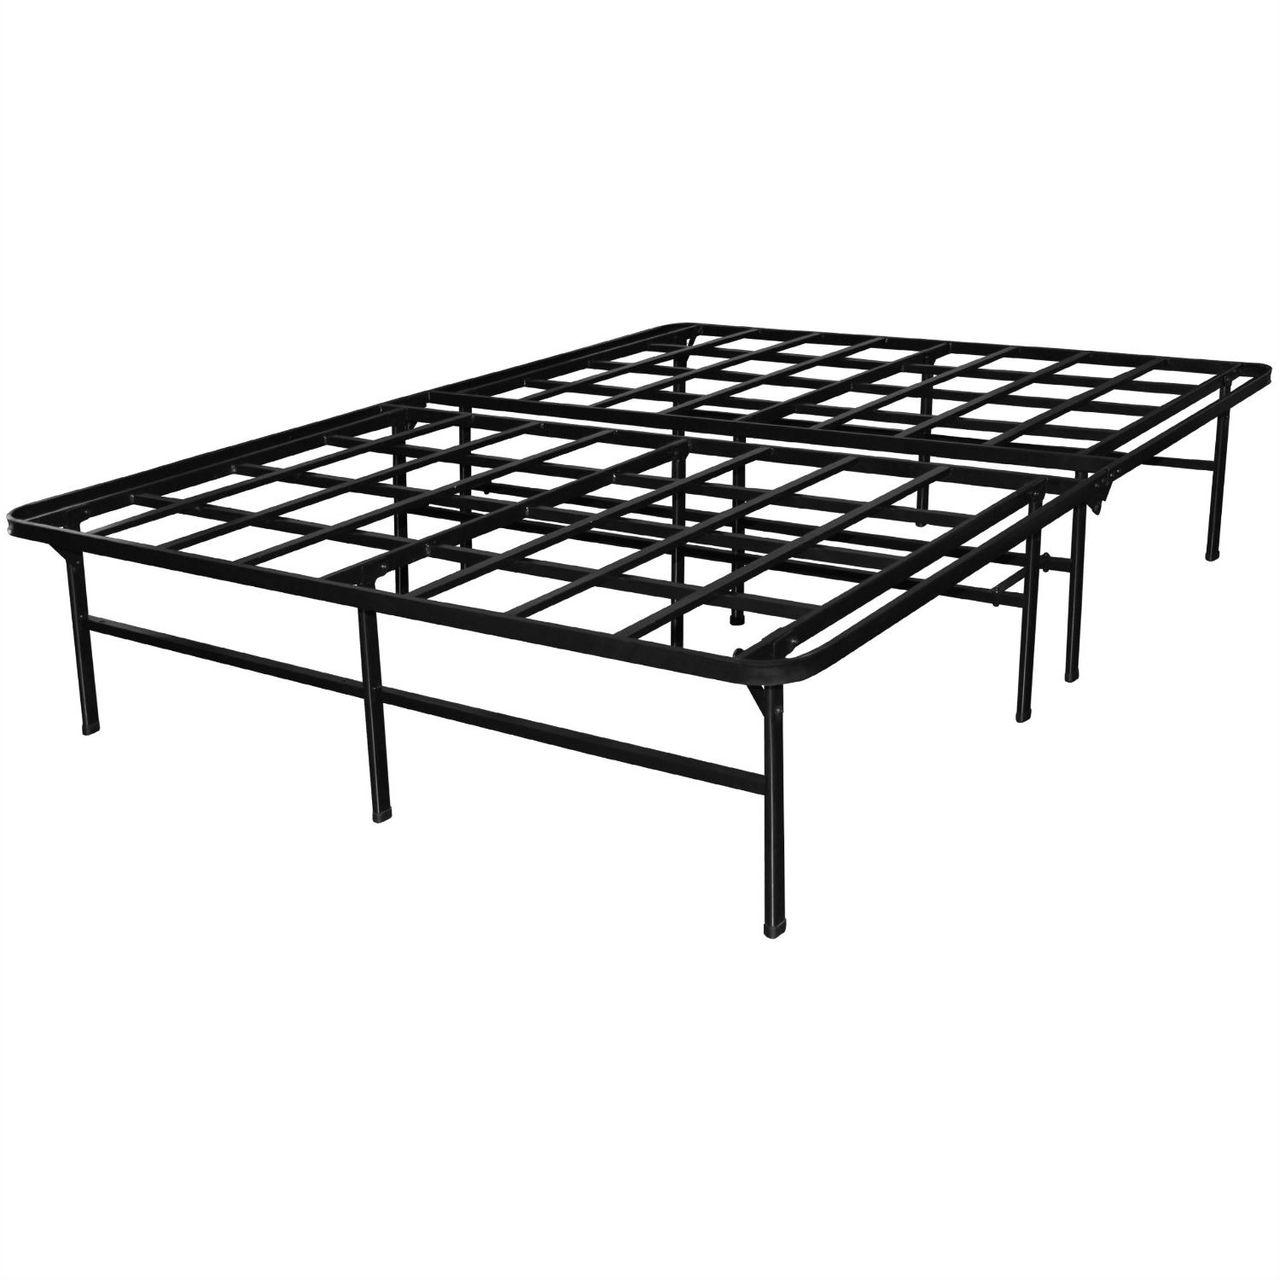 Queen Heavy Duty Metal Platform Bed Frame Supports Up To 4 400 Lbs Metal Platform Bed Platform Bed Frame Full Metal Bed Frame